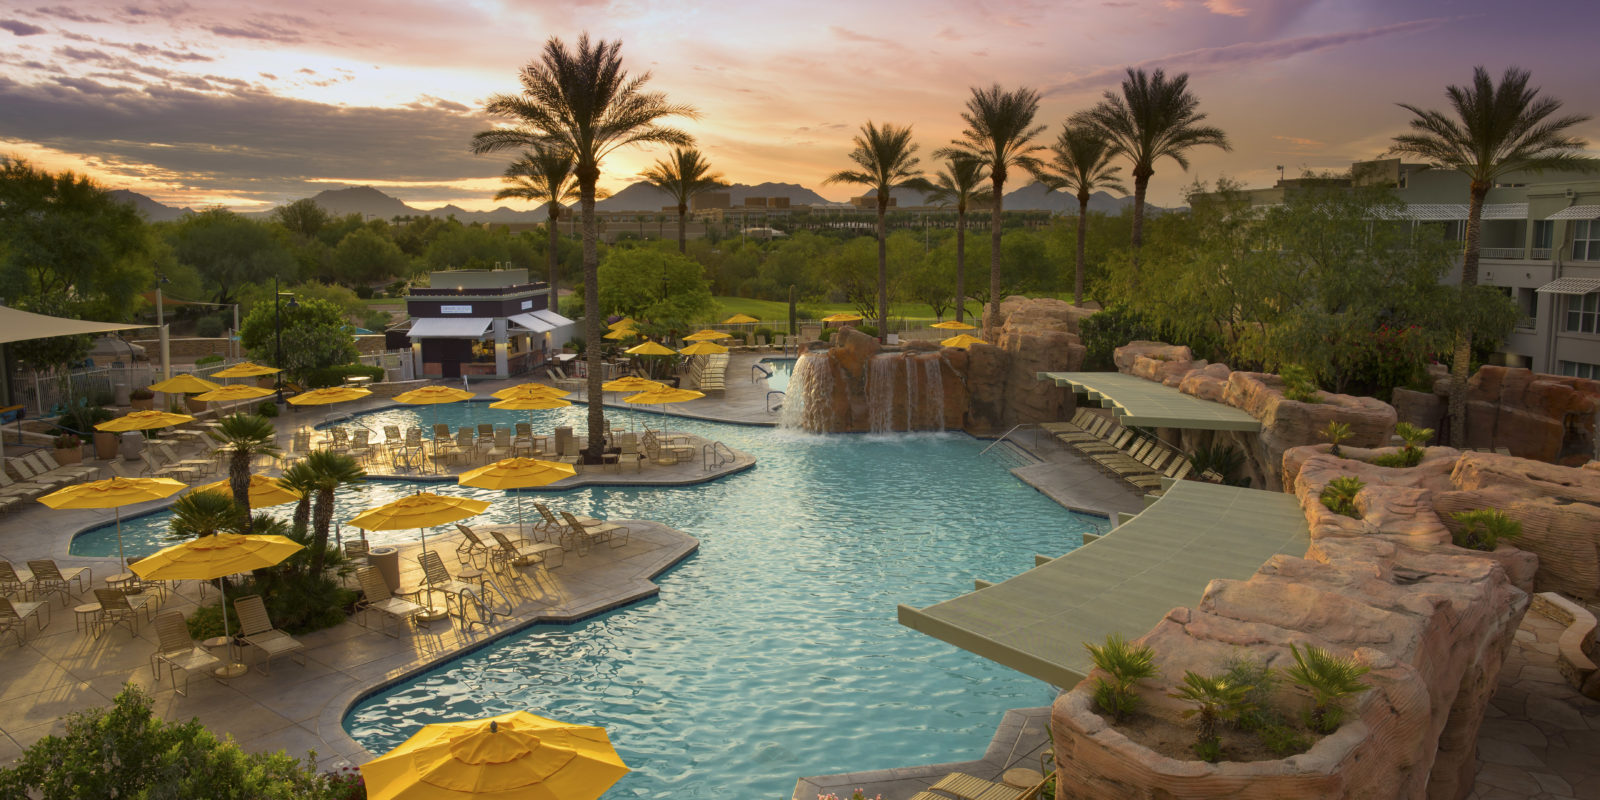 Marriott Vacation Club Shadow Ridge Villas